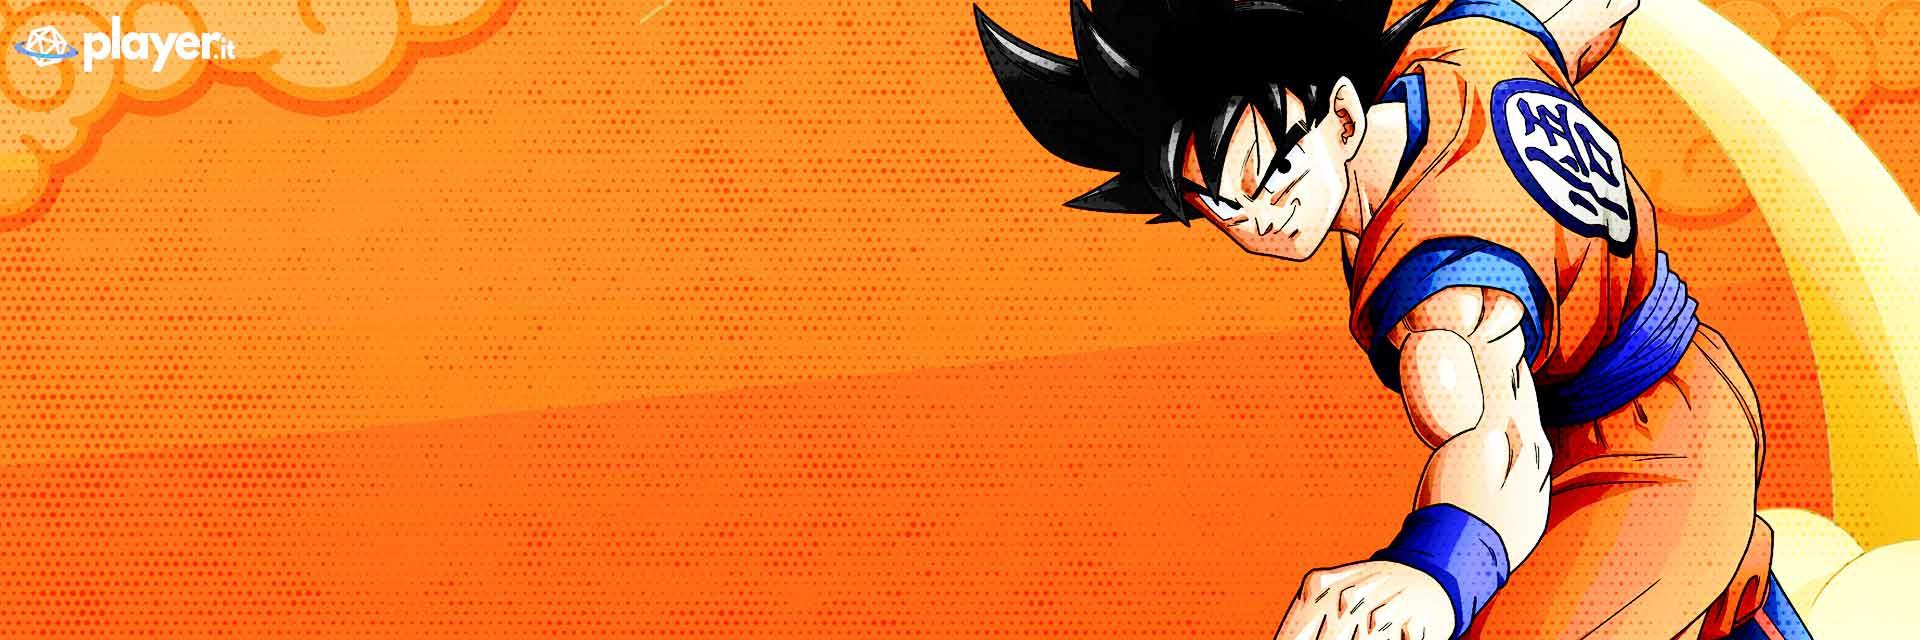 Dragon Ball Z: Kakarot wallpaper HD